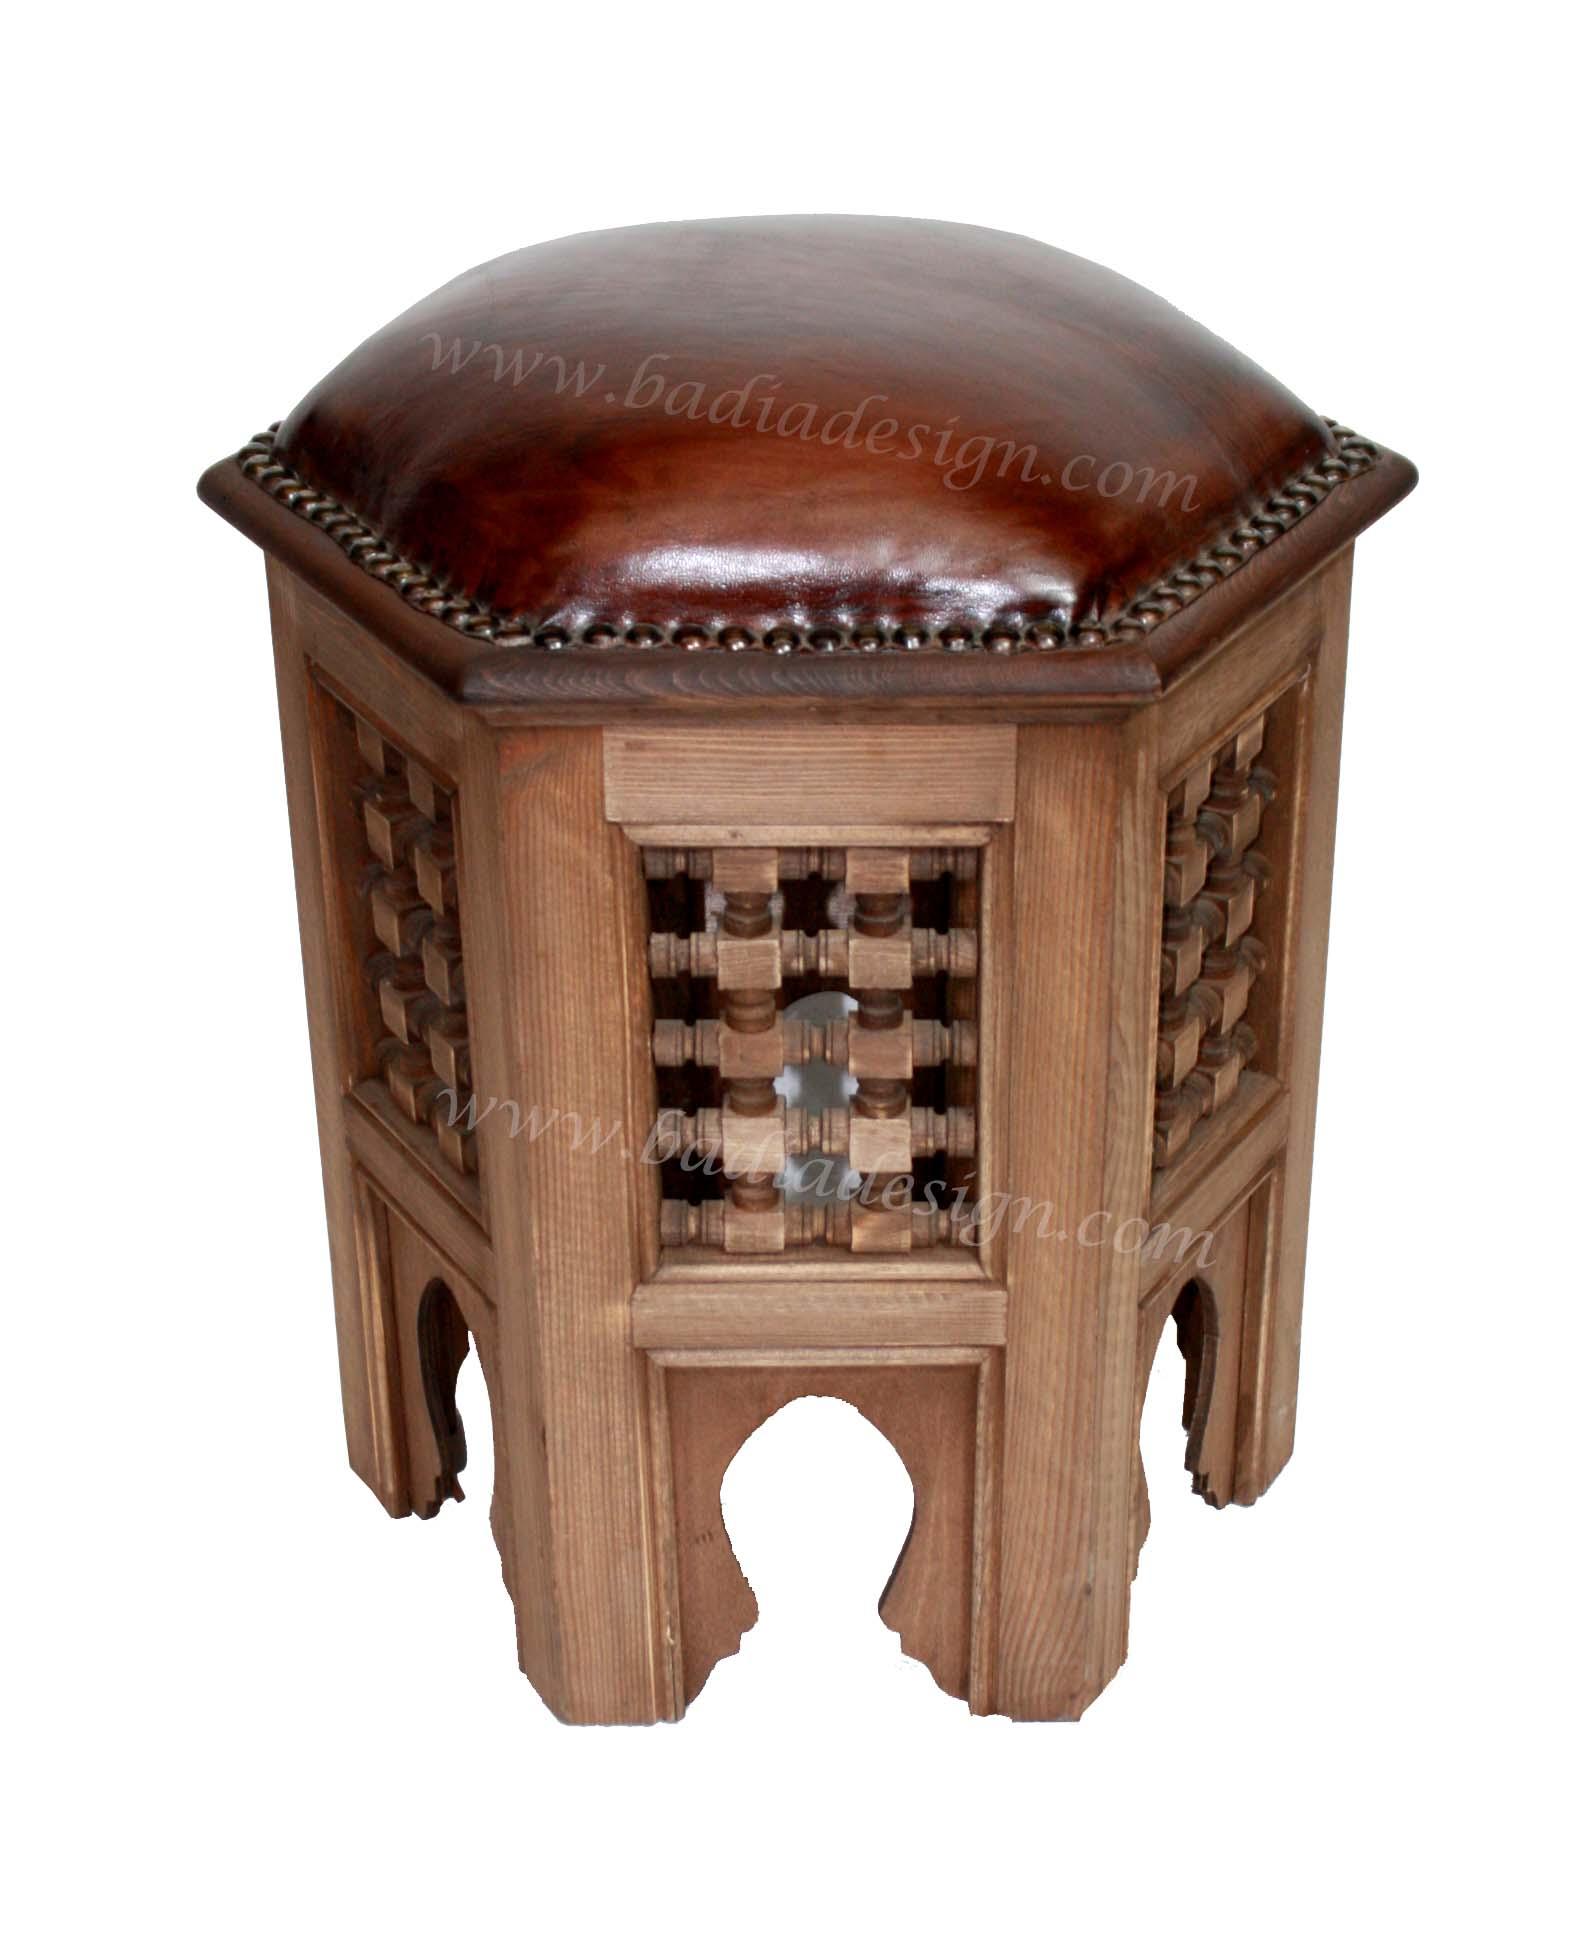 Brown leather ottoman - Brown Leather Ottoman 32